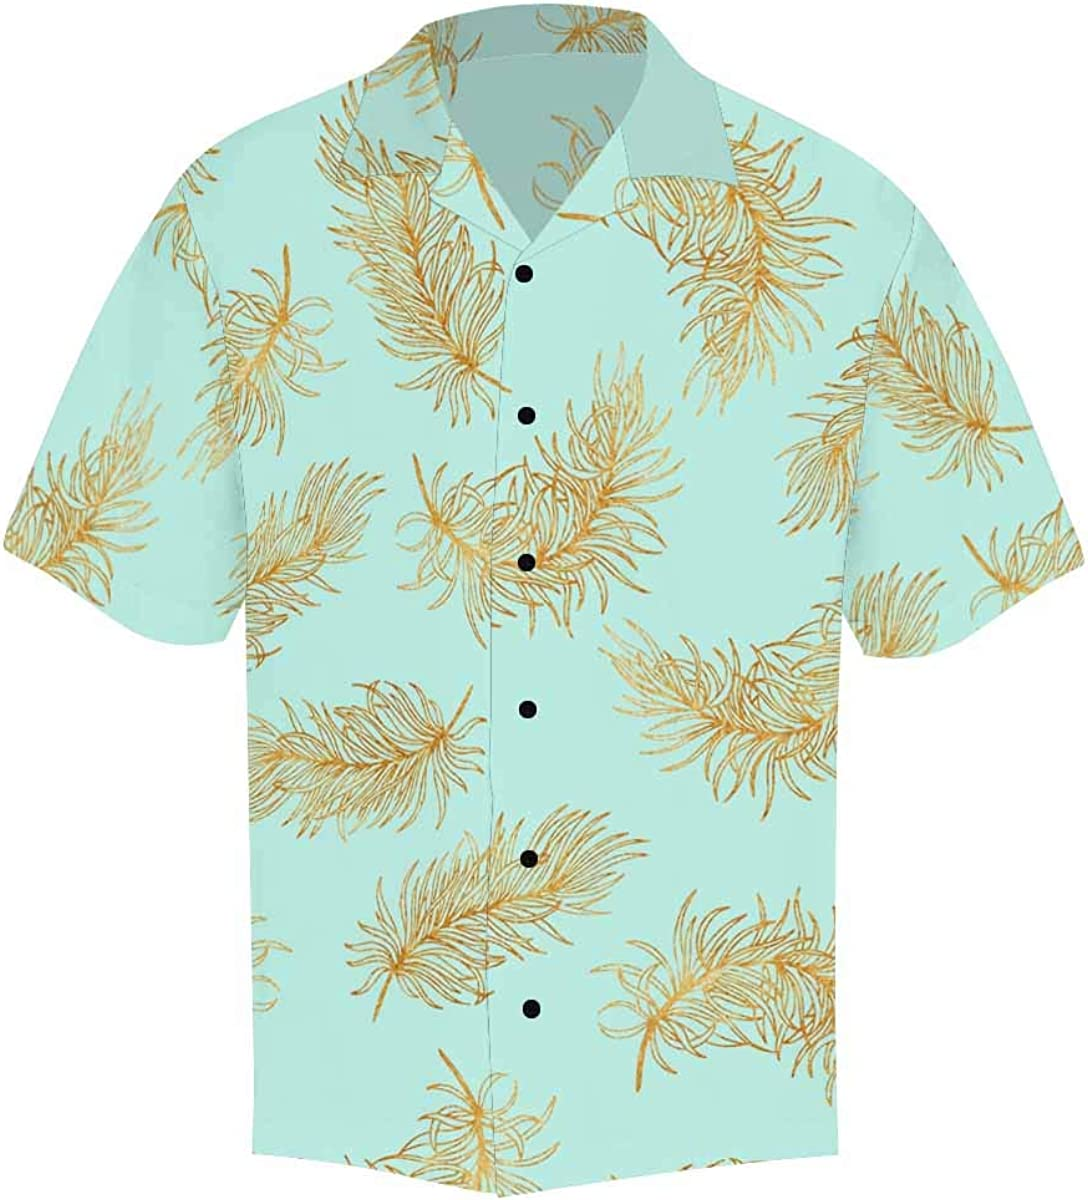 InterestPrint Men's Casual Button Down Short Sleeve Multicolor Easter Egg Hawaiian Shirt (S-5XL)